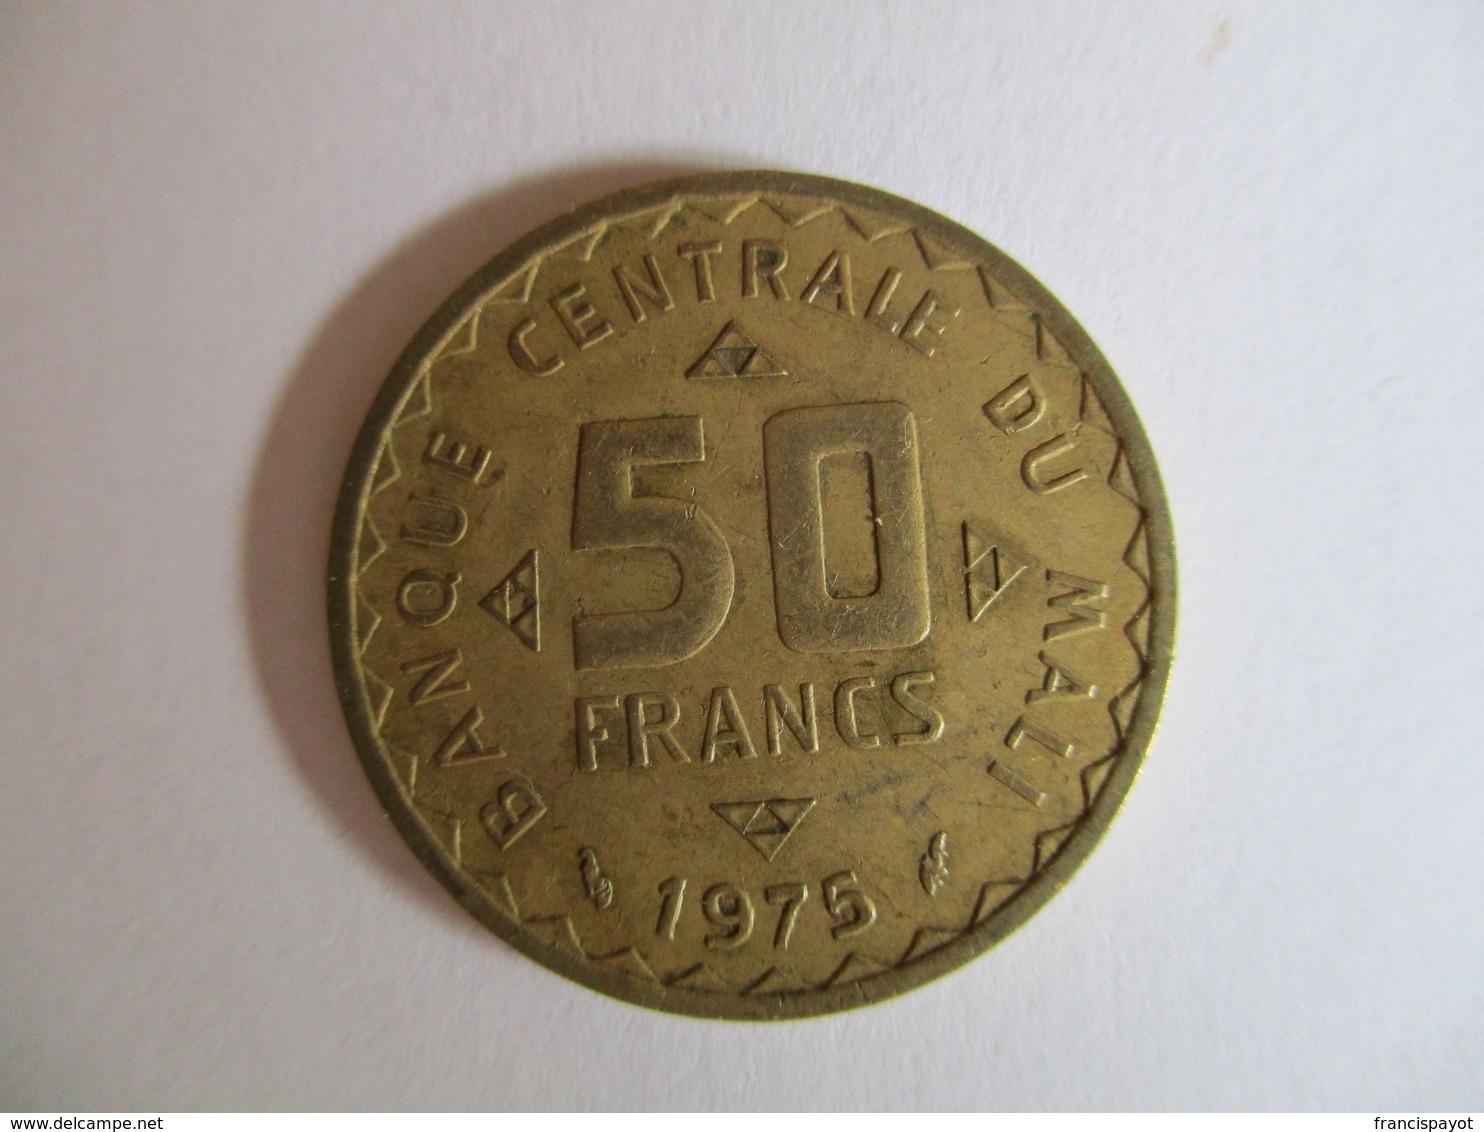 Mali: 50 Francs 1975 - Mali (1962-1984)